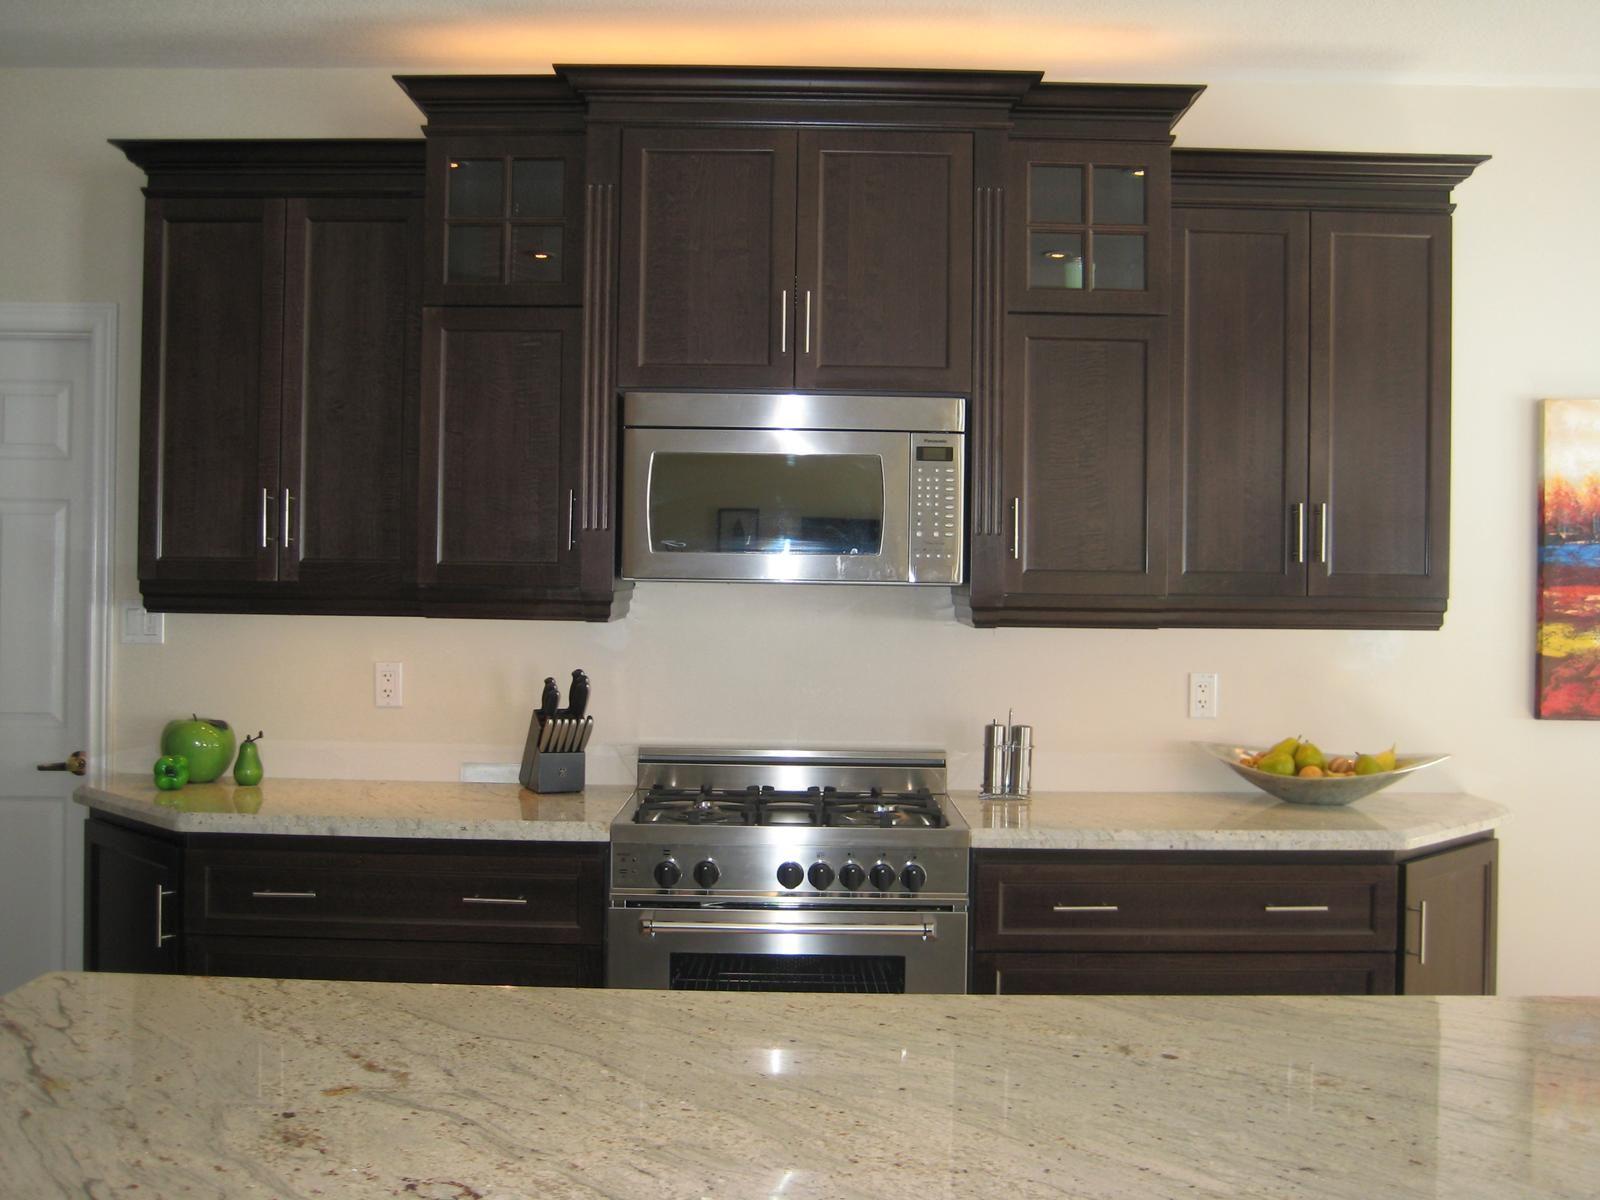 White Kitchens With Granite Countertops River White Granite